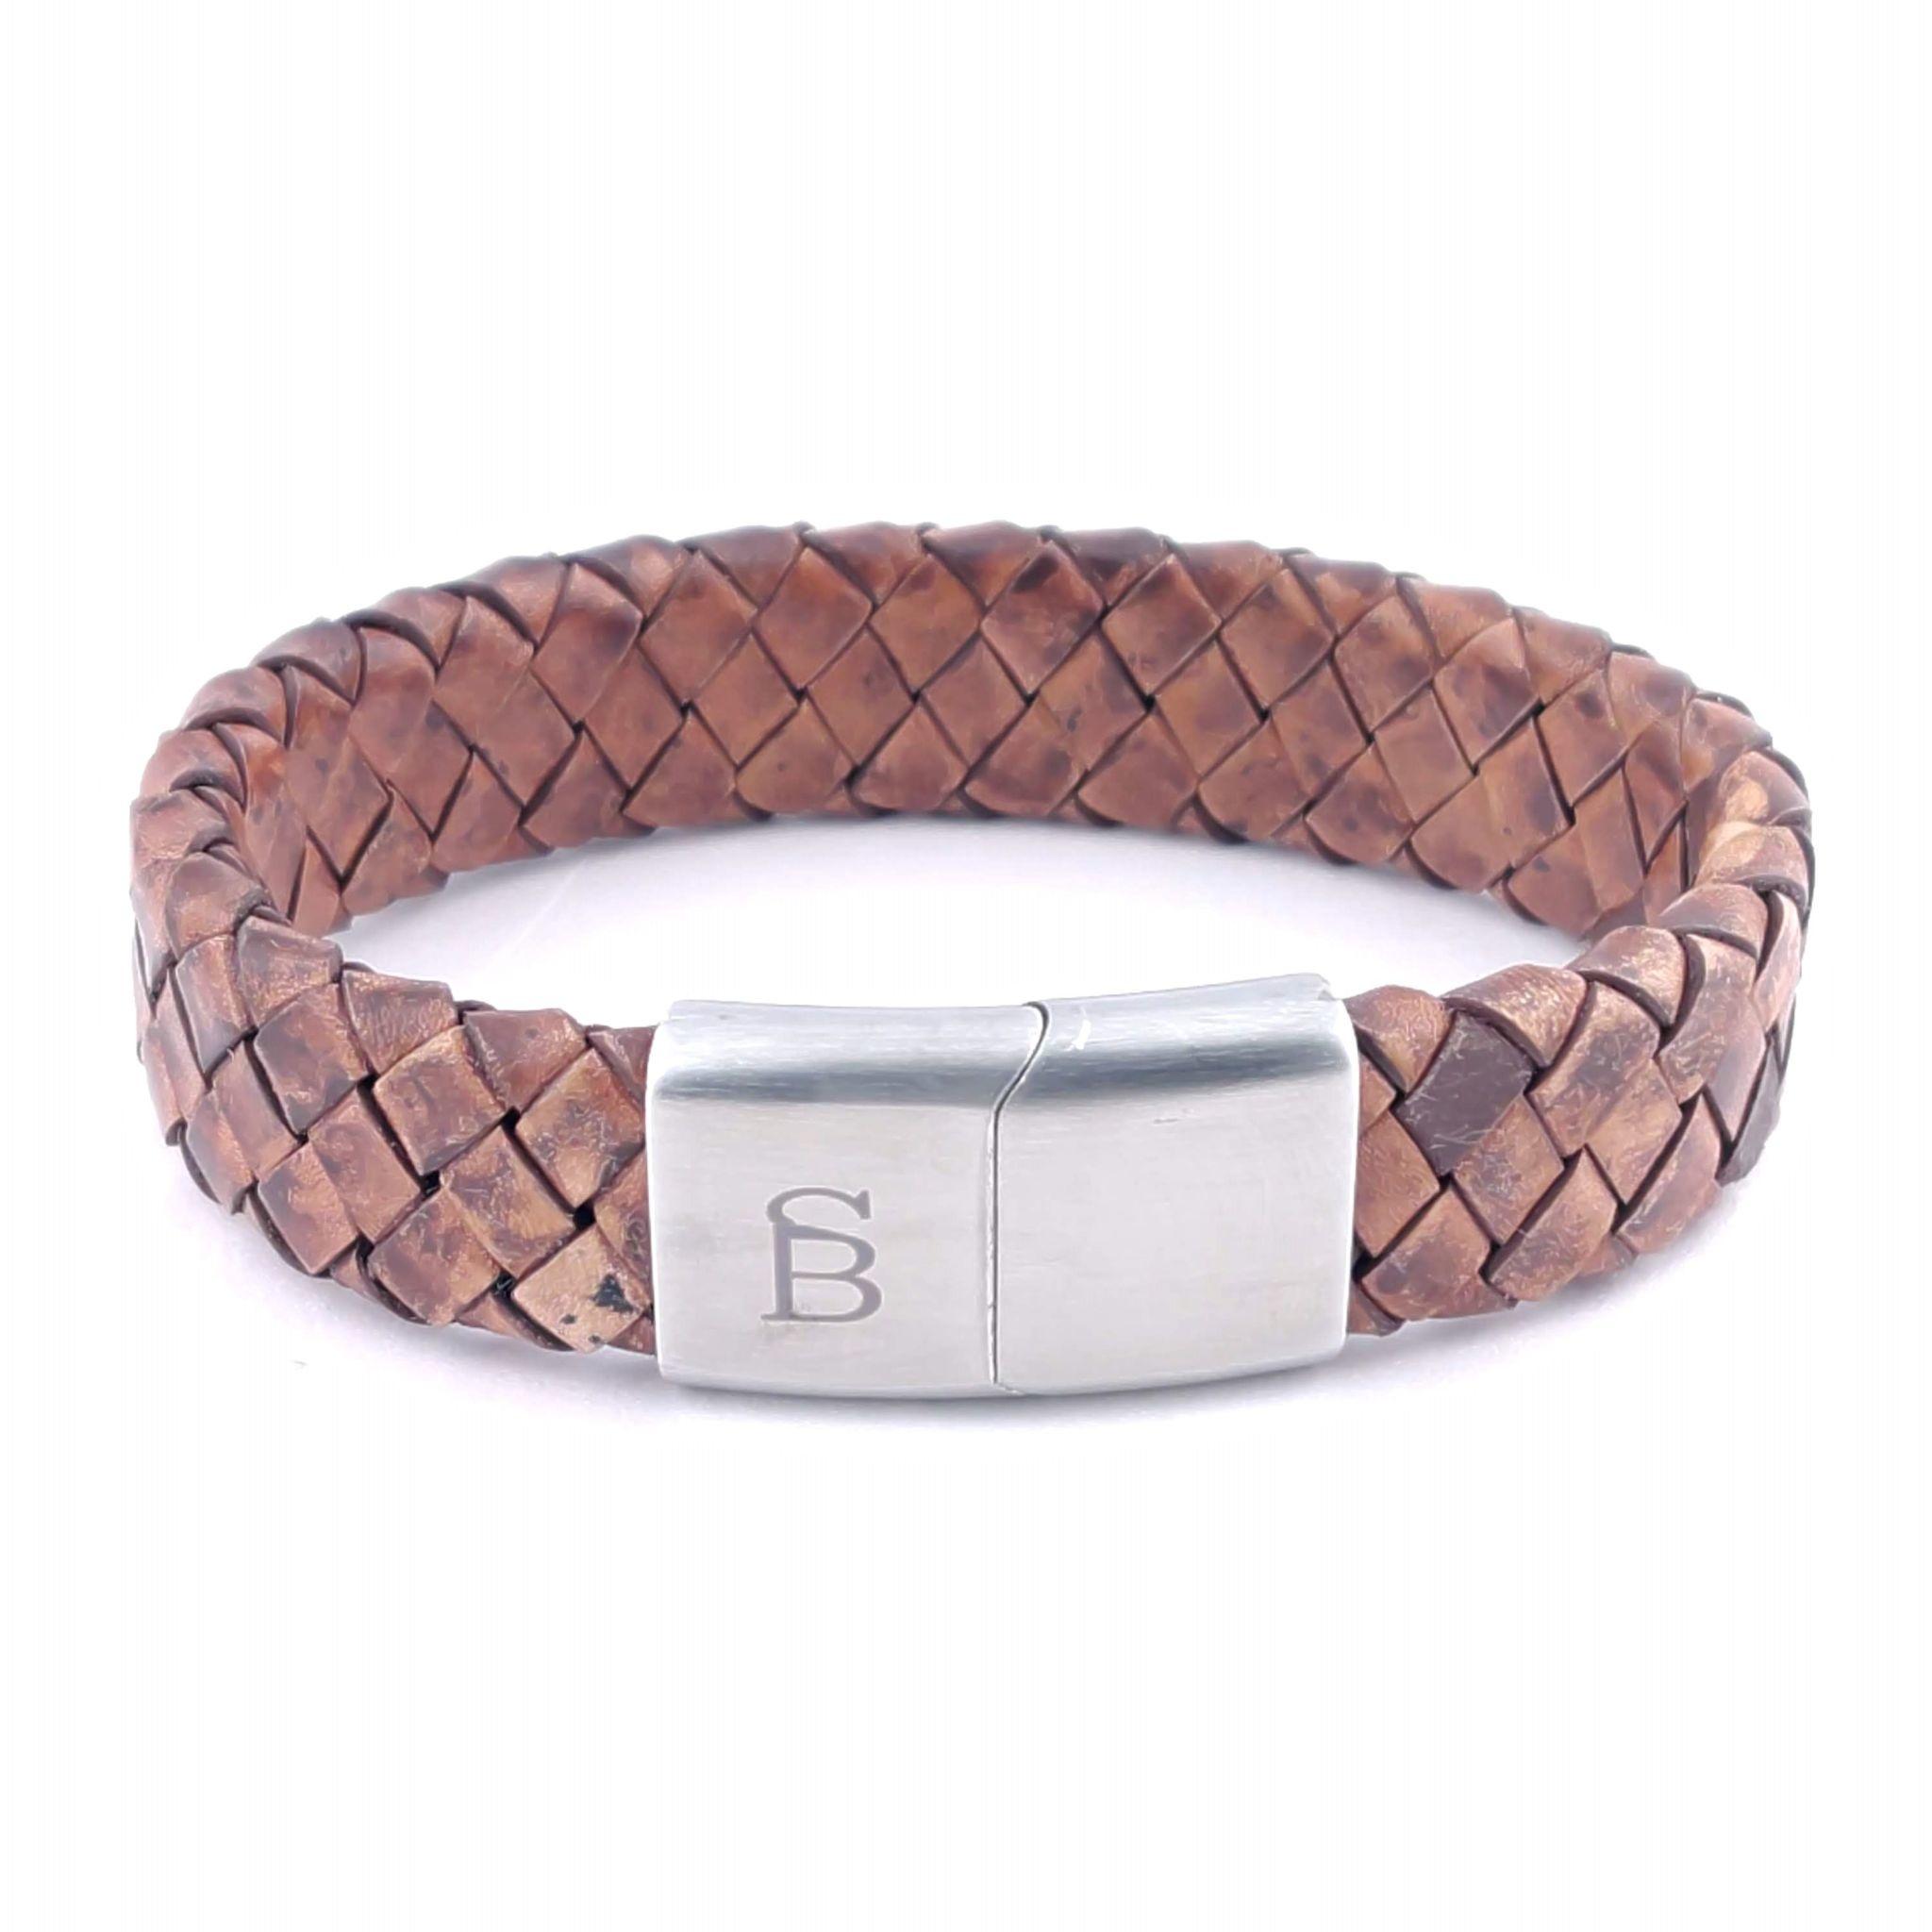 Steel & Barnett Leather bracelet Preston - Caramel - Size M